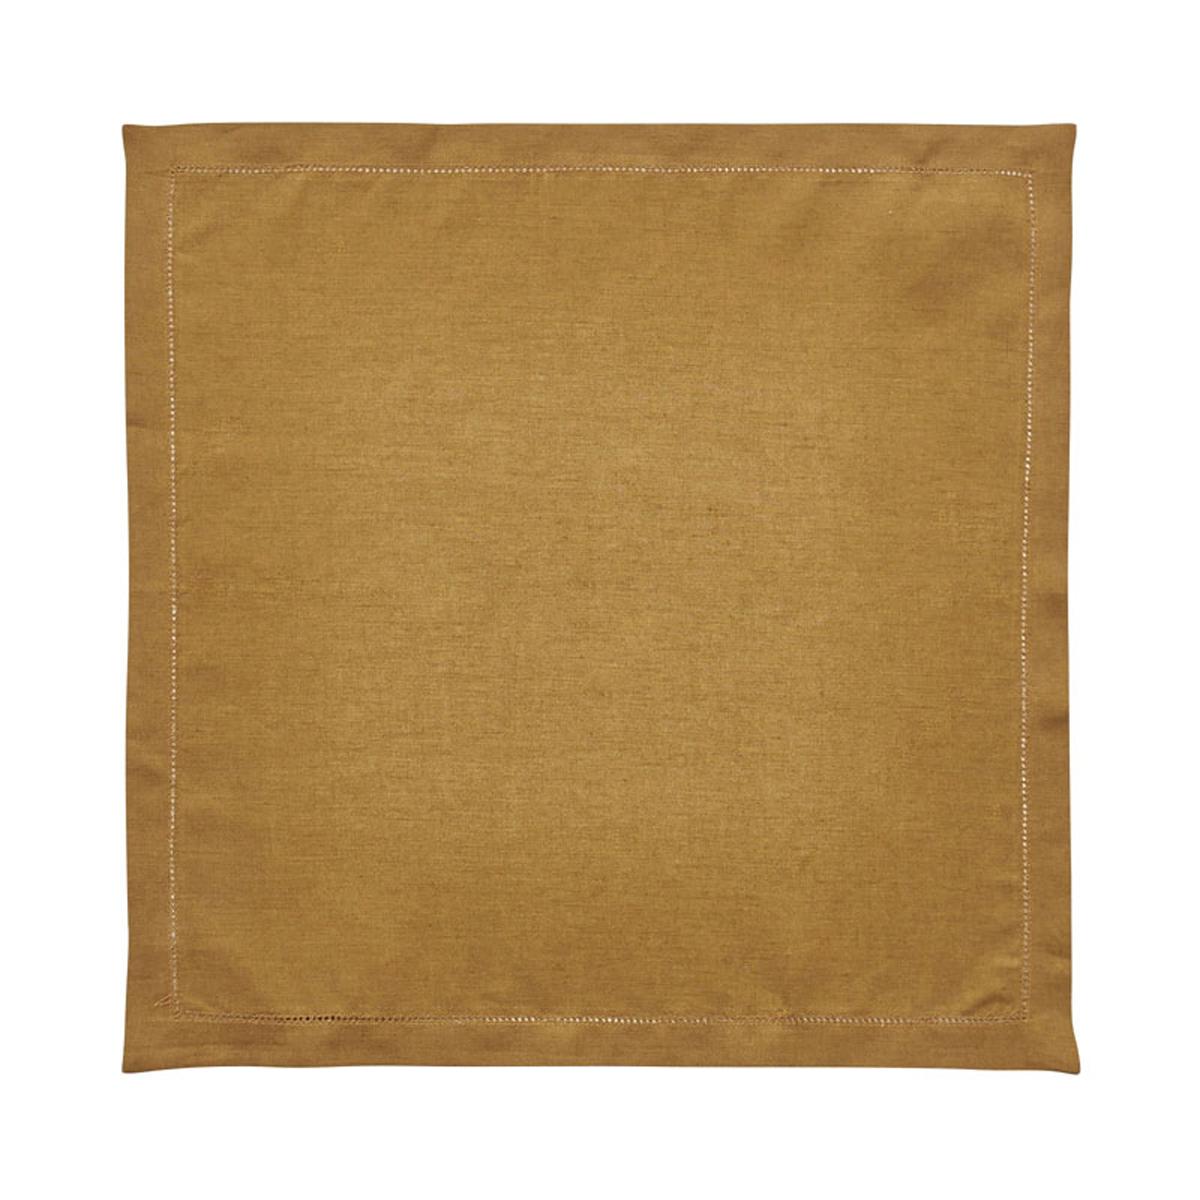 Serviette de table en lin marron 50x50